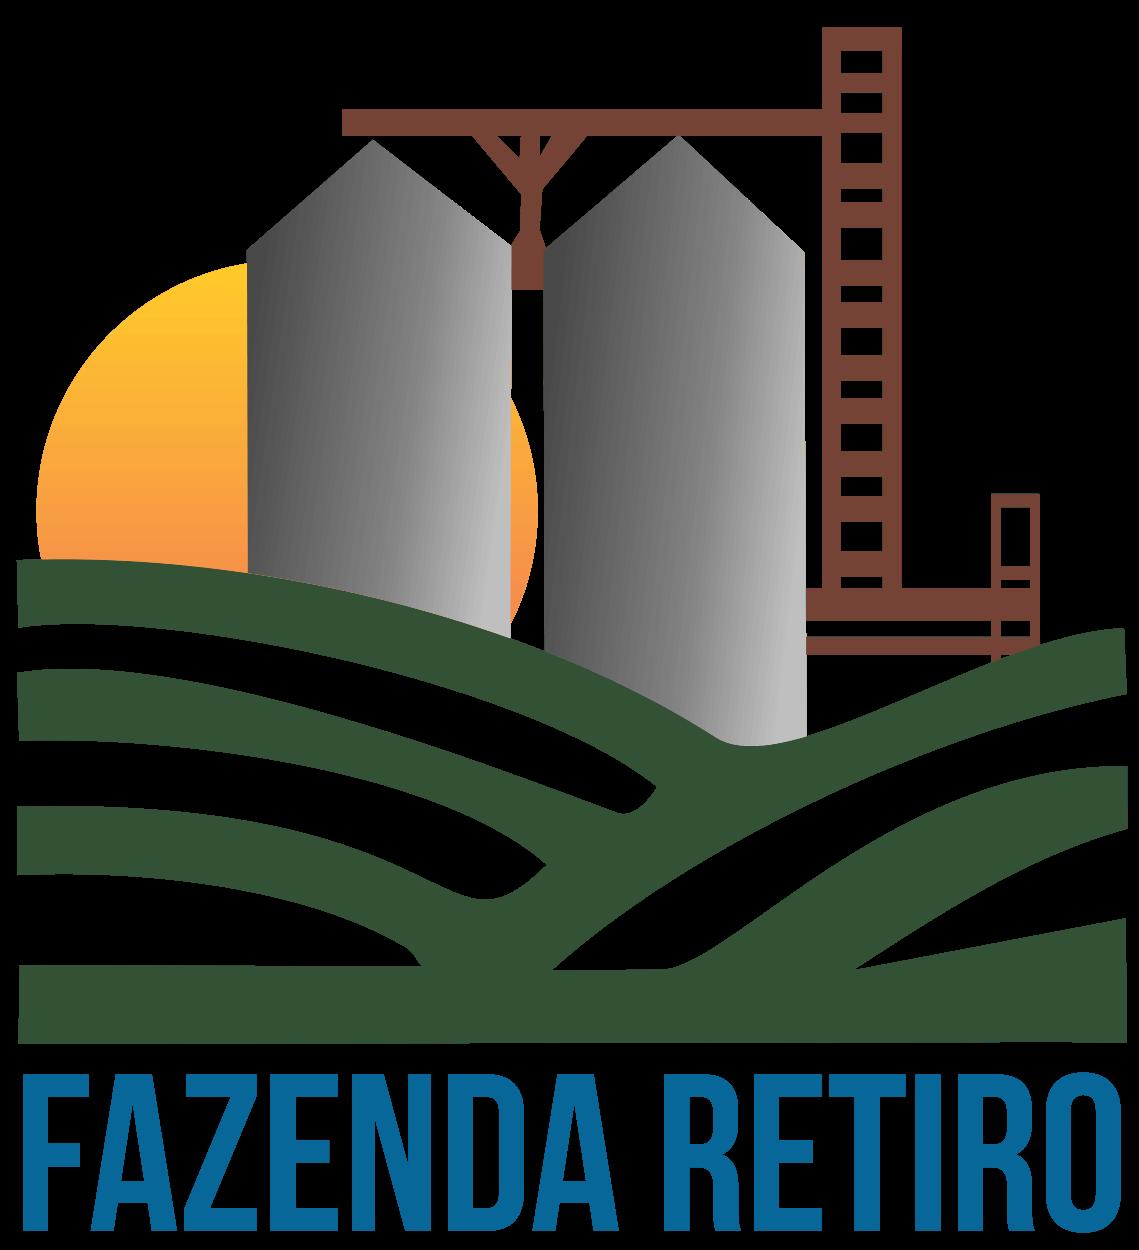 fazenda retiro_f